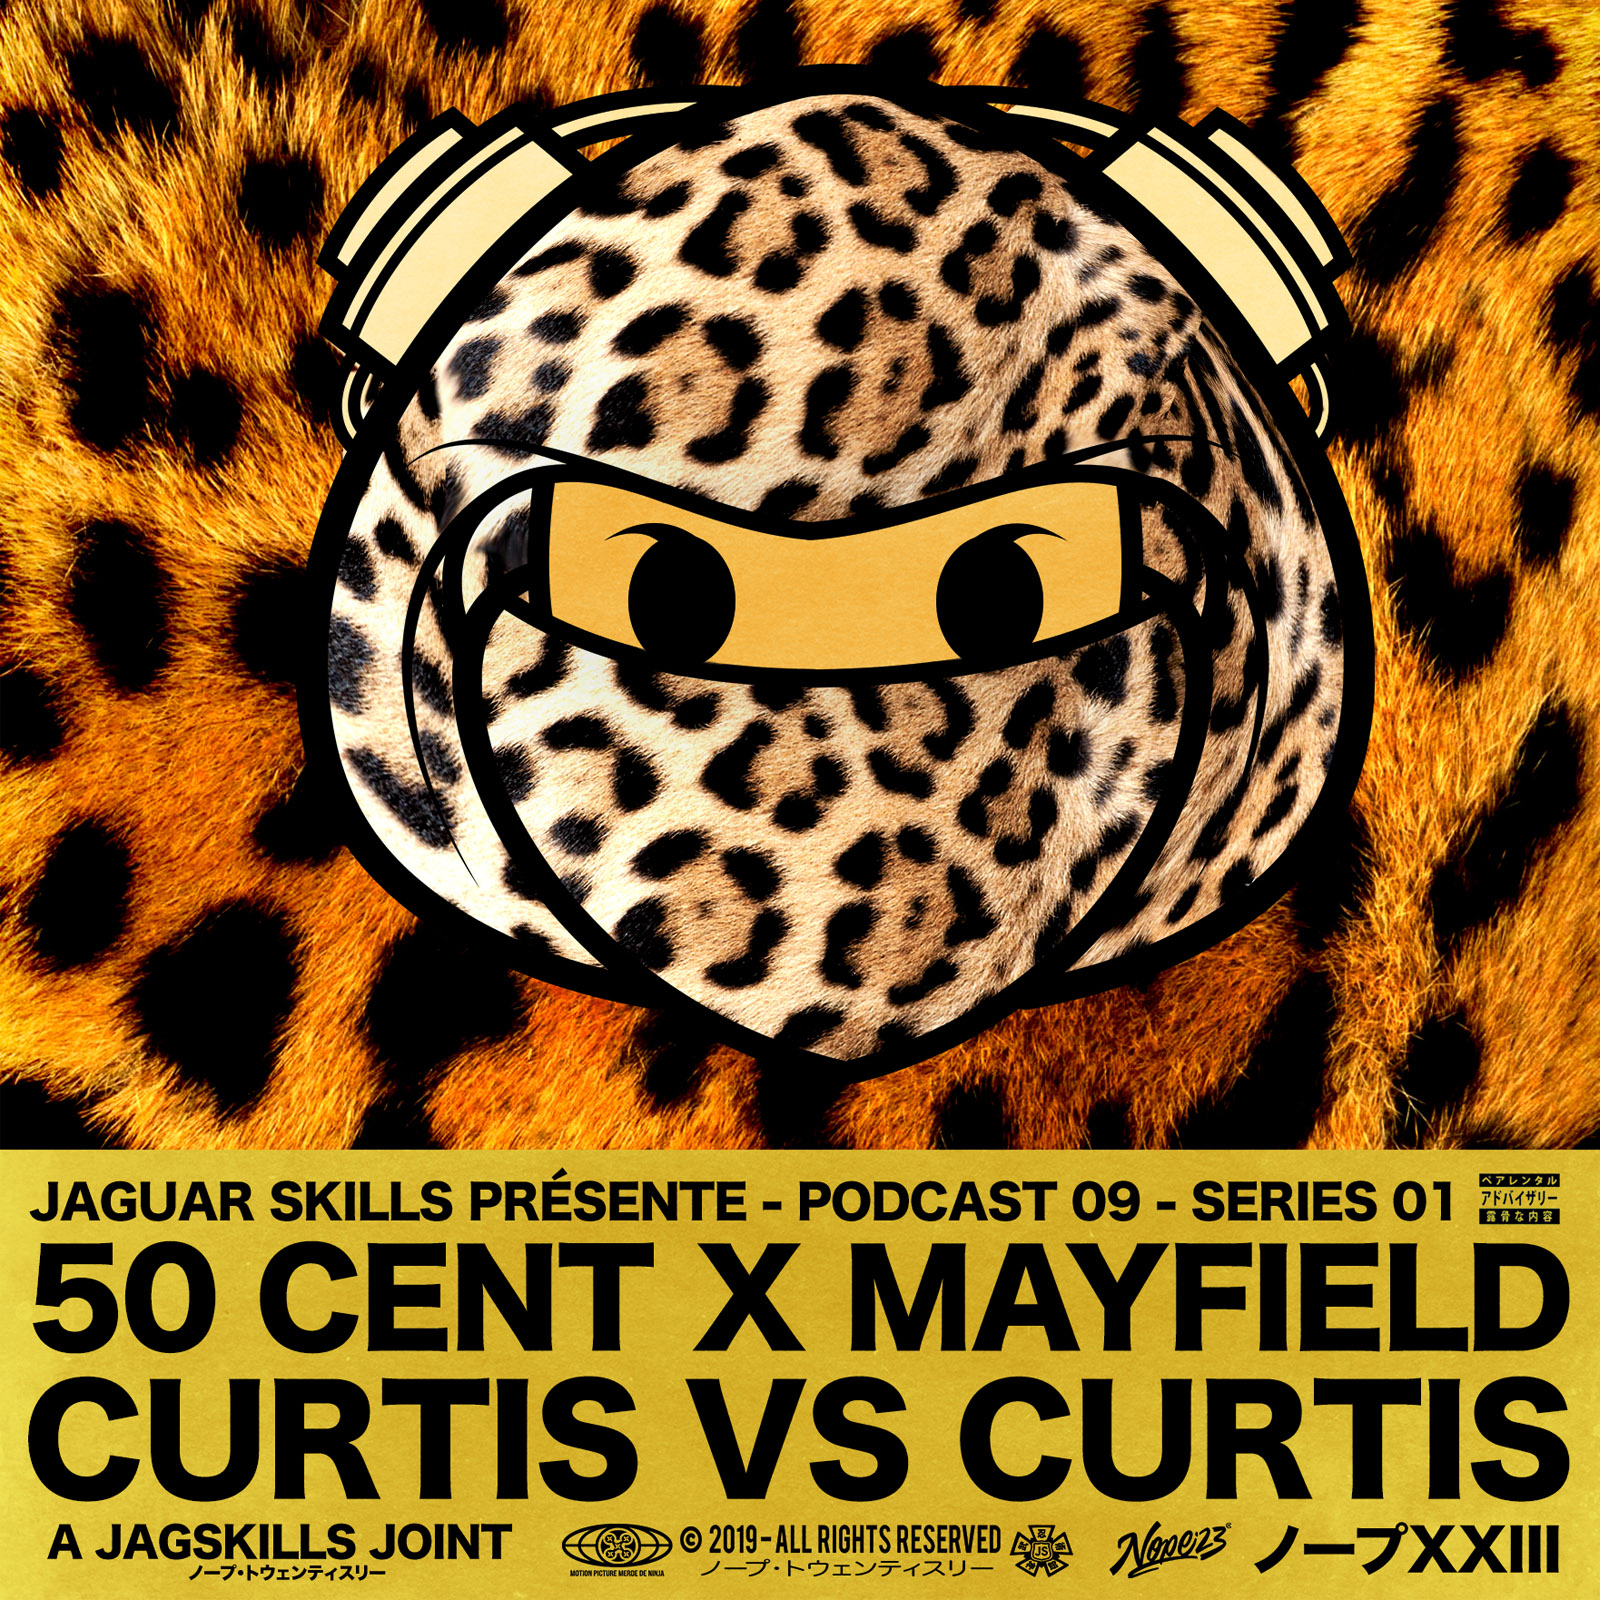 A JAGSKILLS JOINT – 50 CENT & CURTIS MAYFIELD - CURTIS VS CURTIS